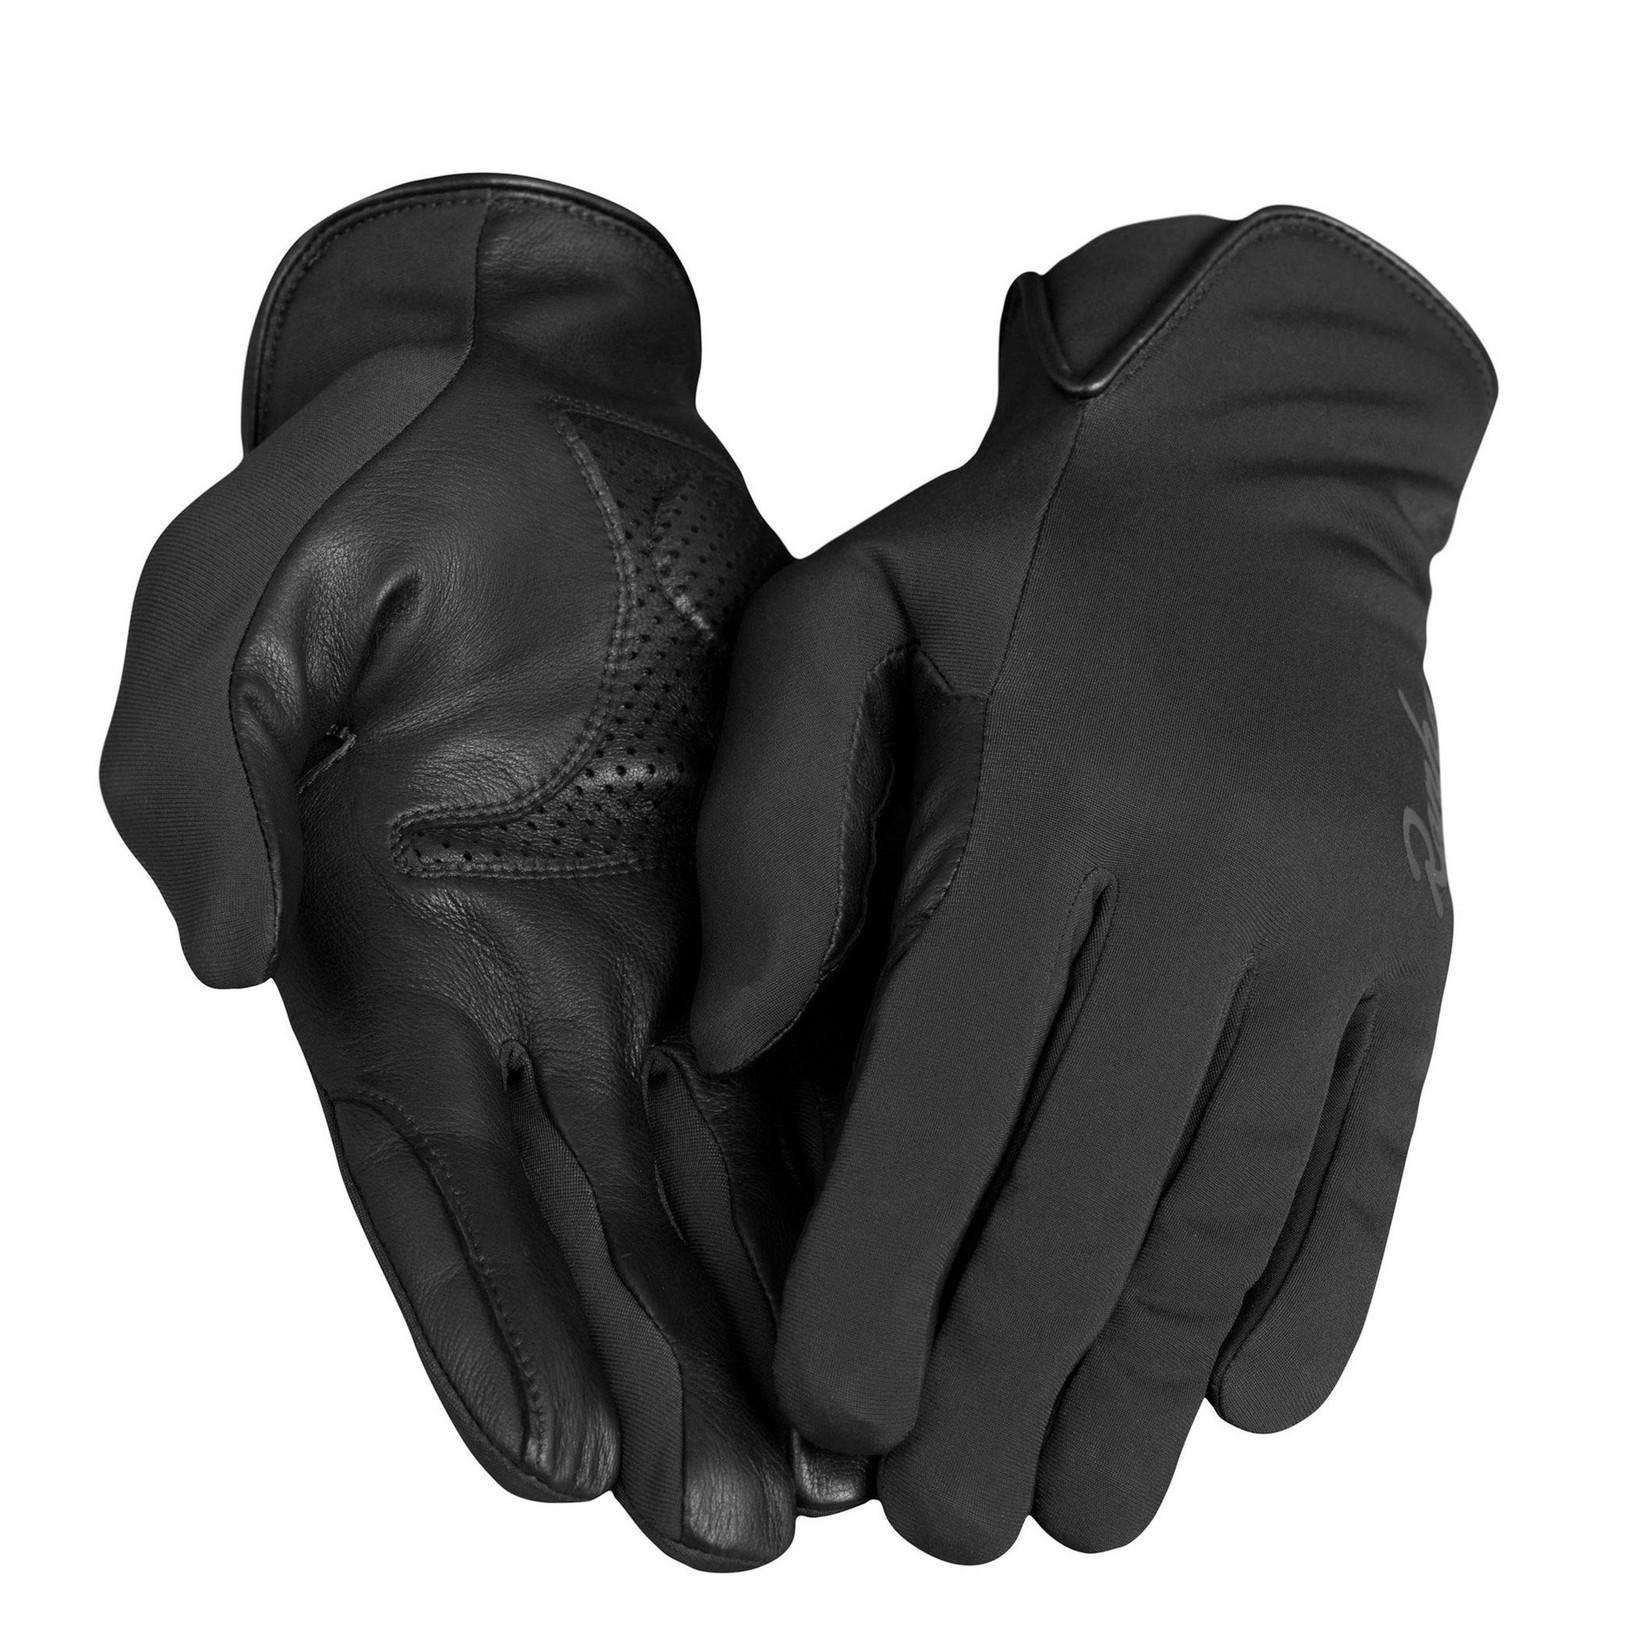 Rapha Rapha Classic Gloves